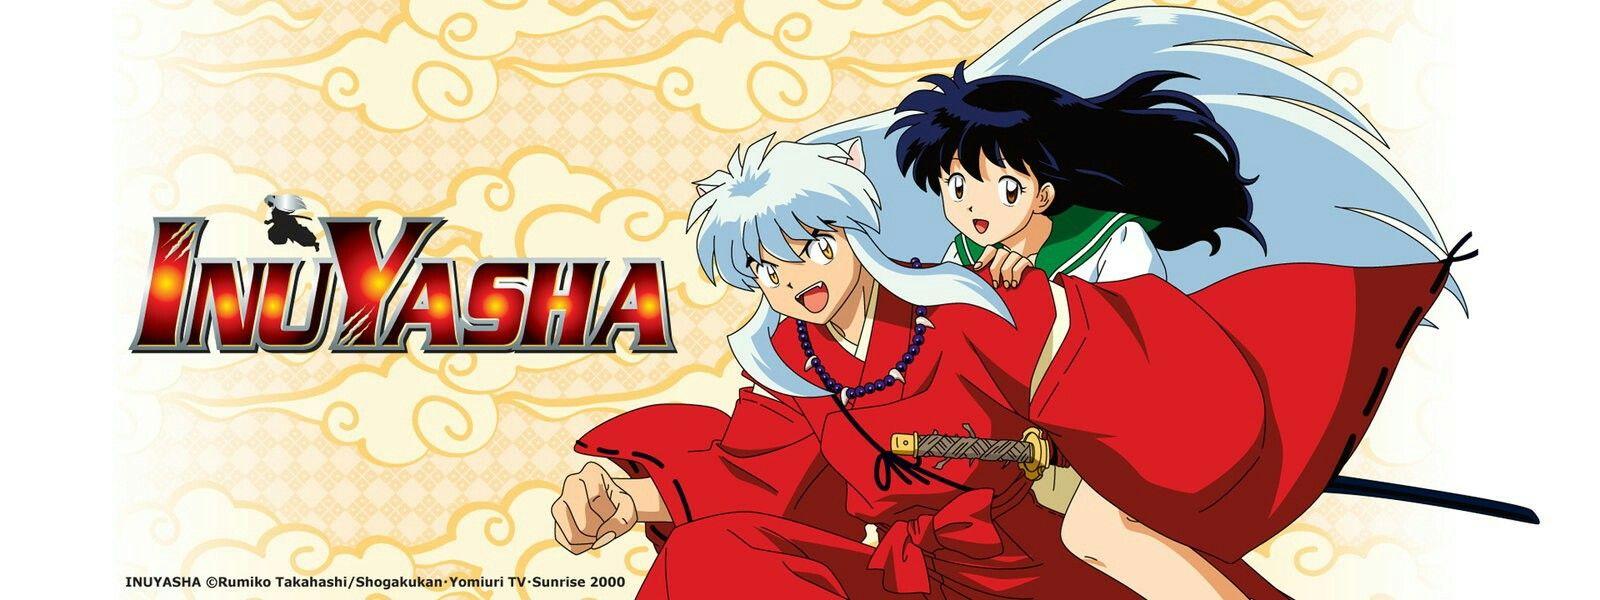 Pin by Mia Leonard on Anime Inuyasha, Anime funny, Anime